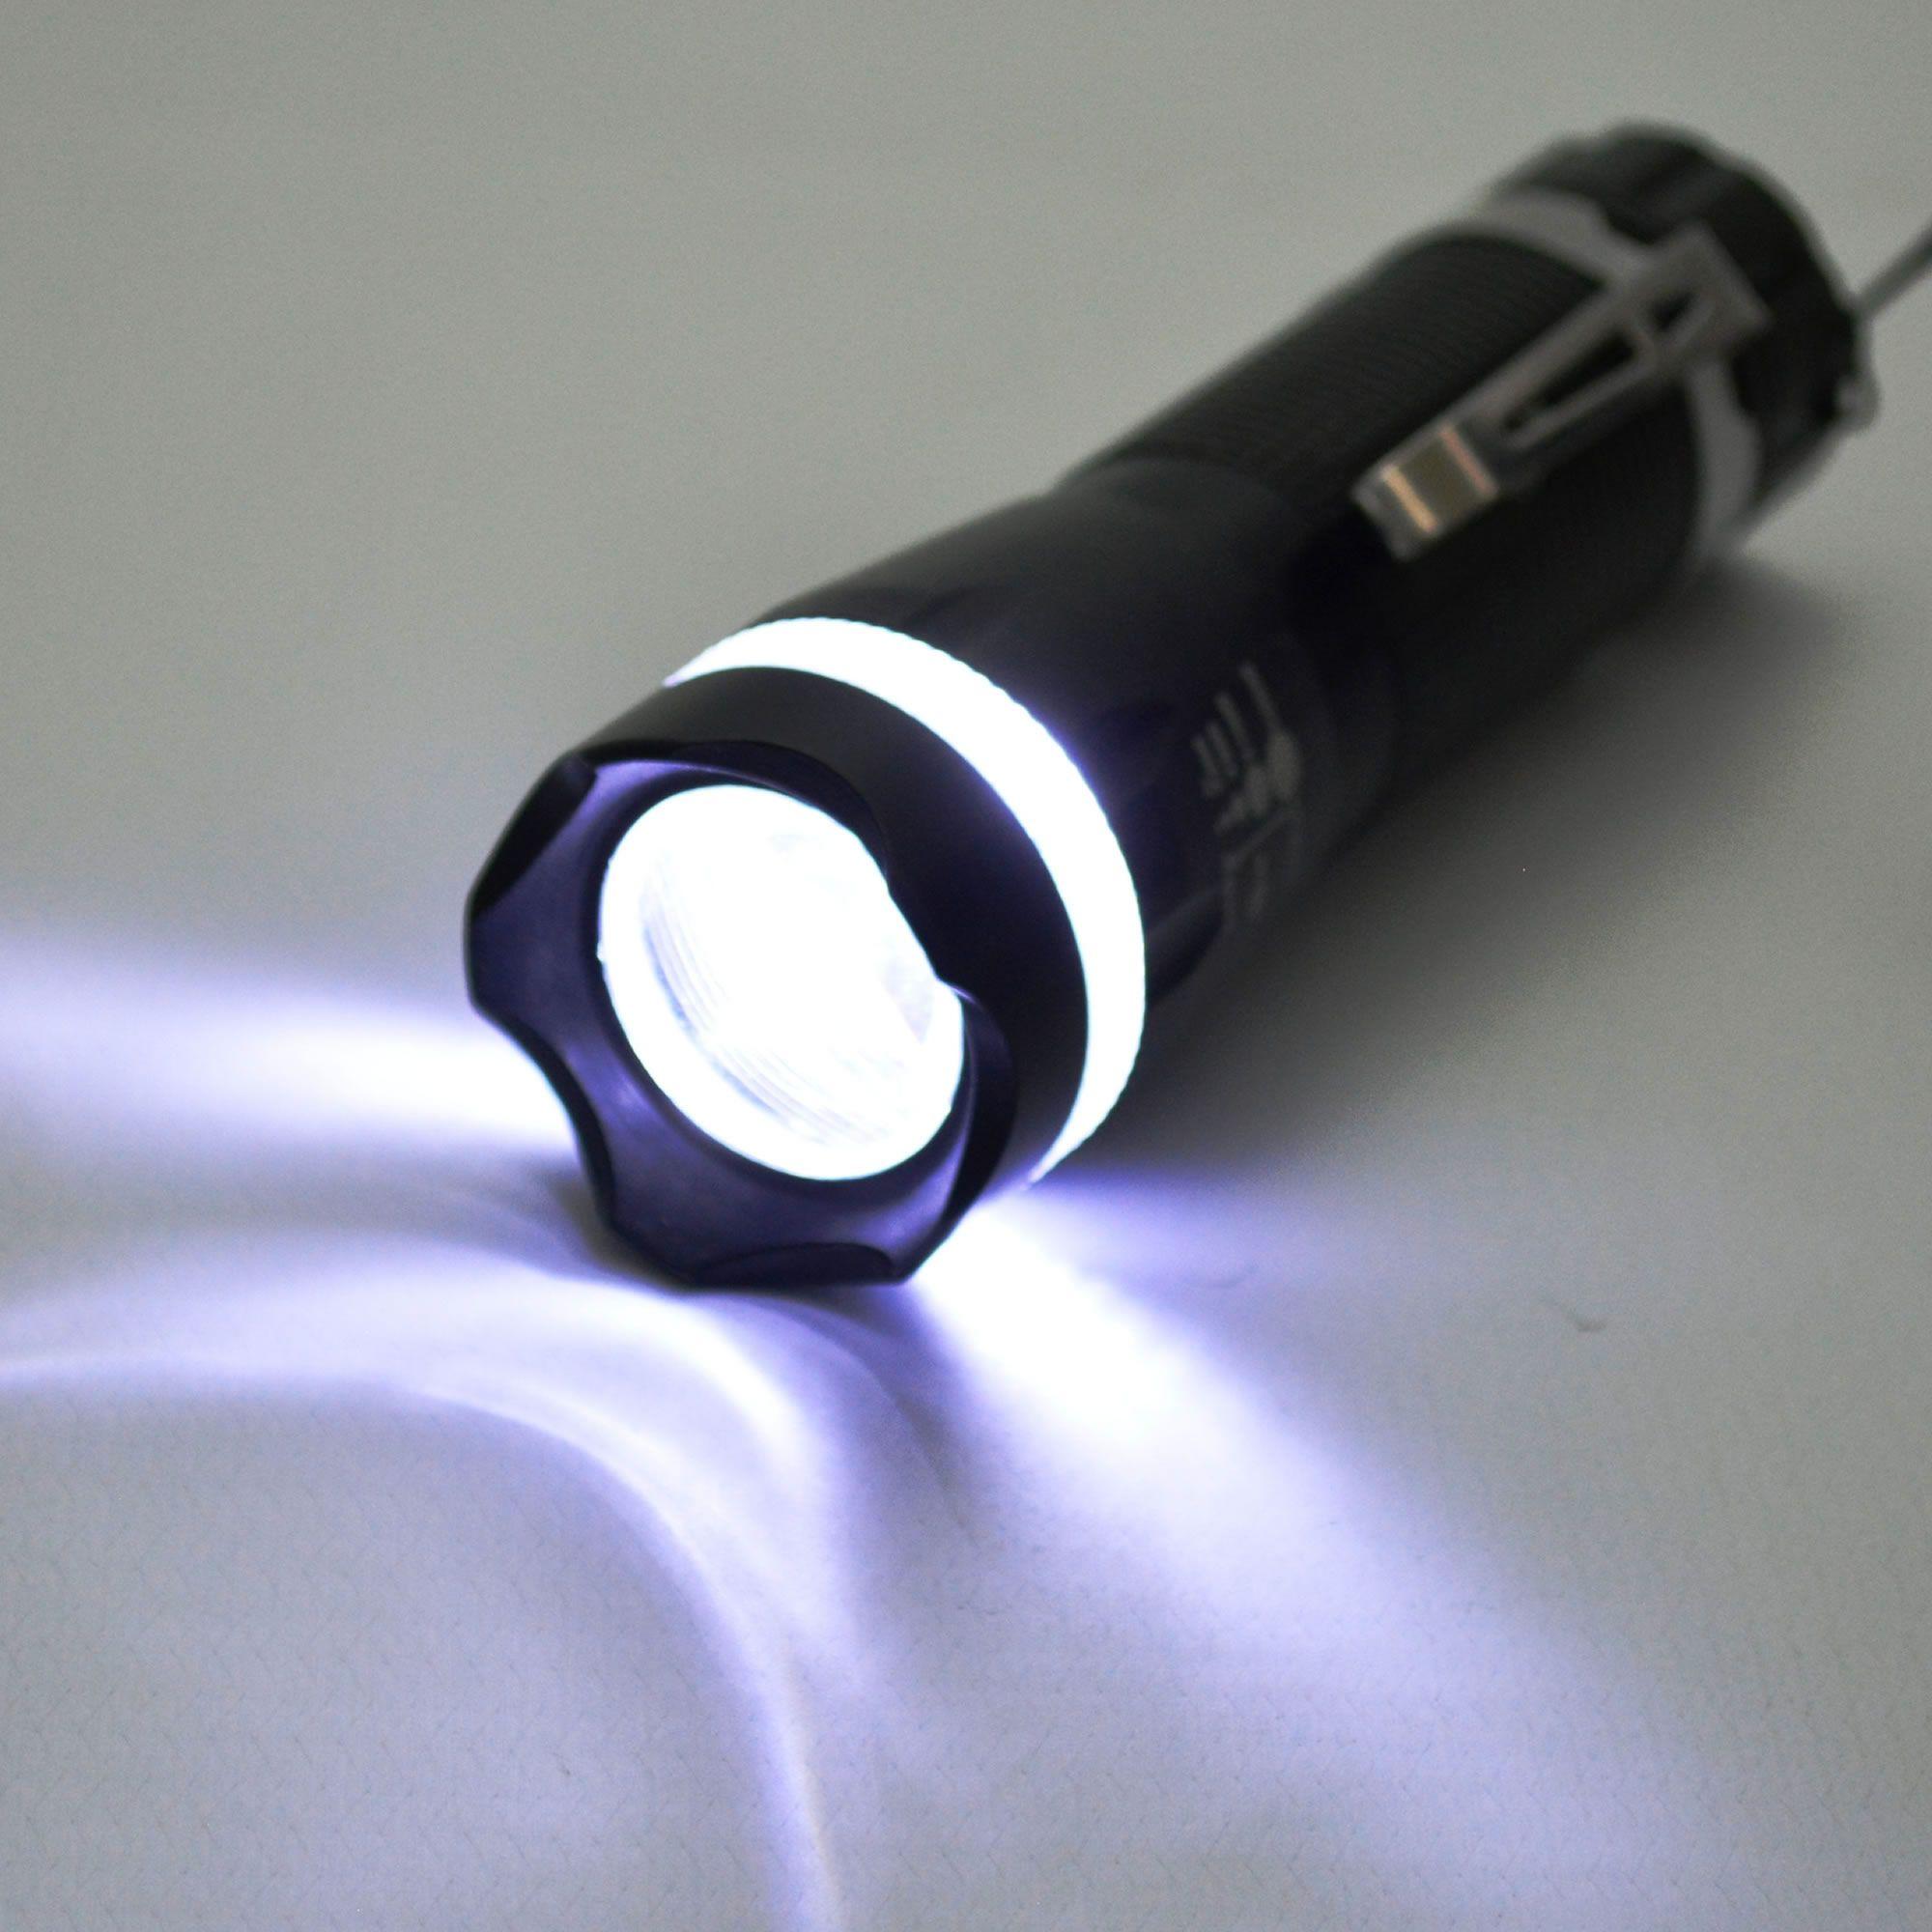 Lanterna Tática Policial LED Pilhas 10cm Prata CBRN11490